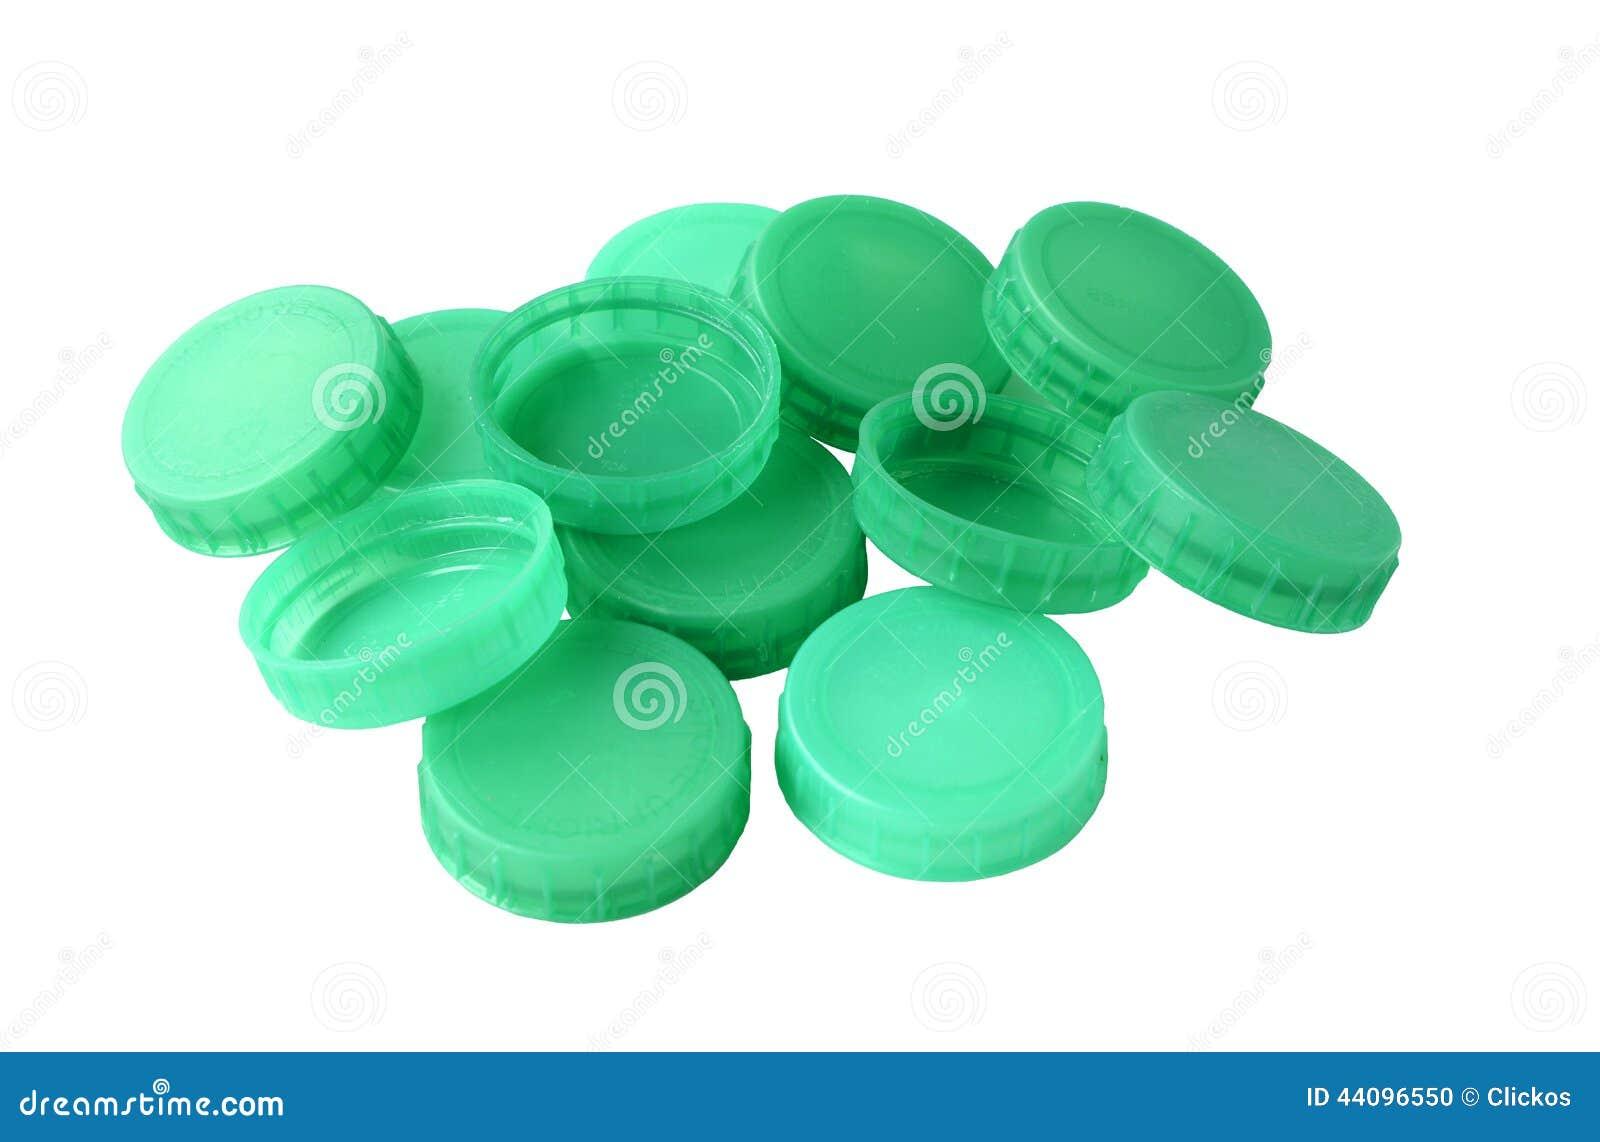 Green Plastic Bottle Tops Stock Photo Image 44096550